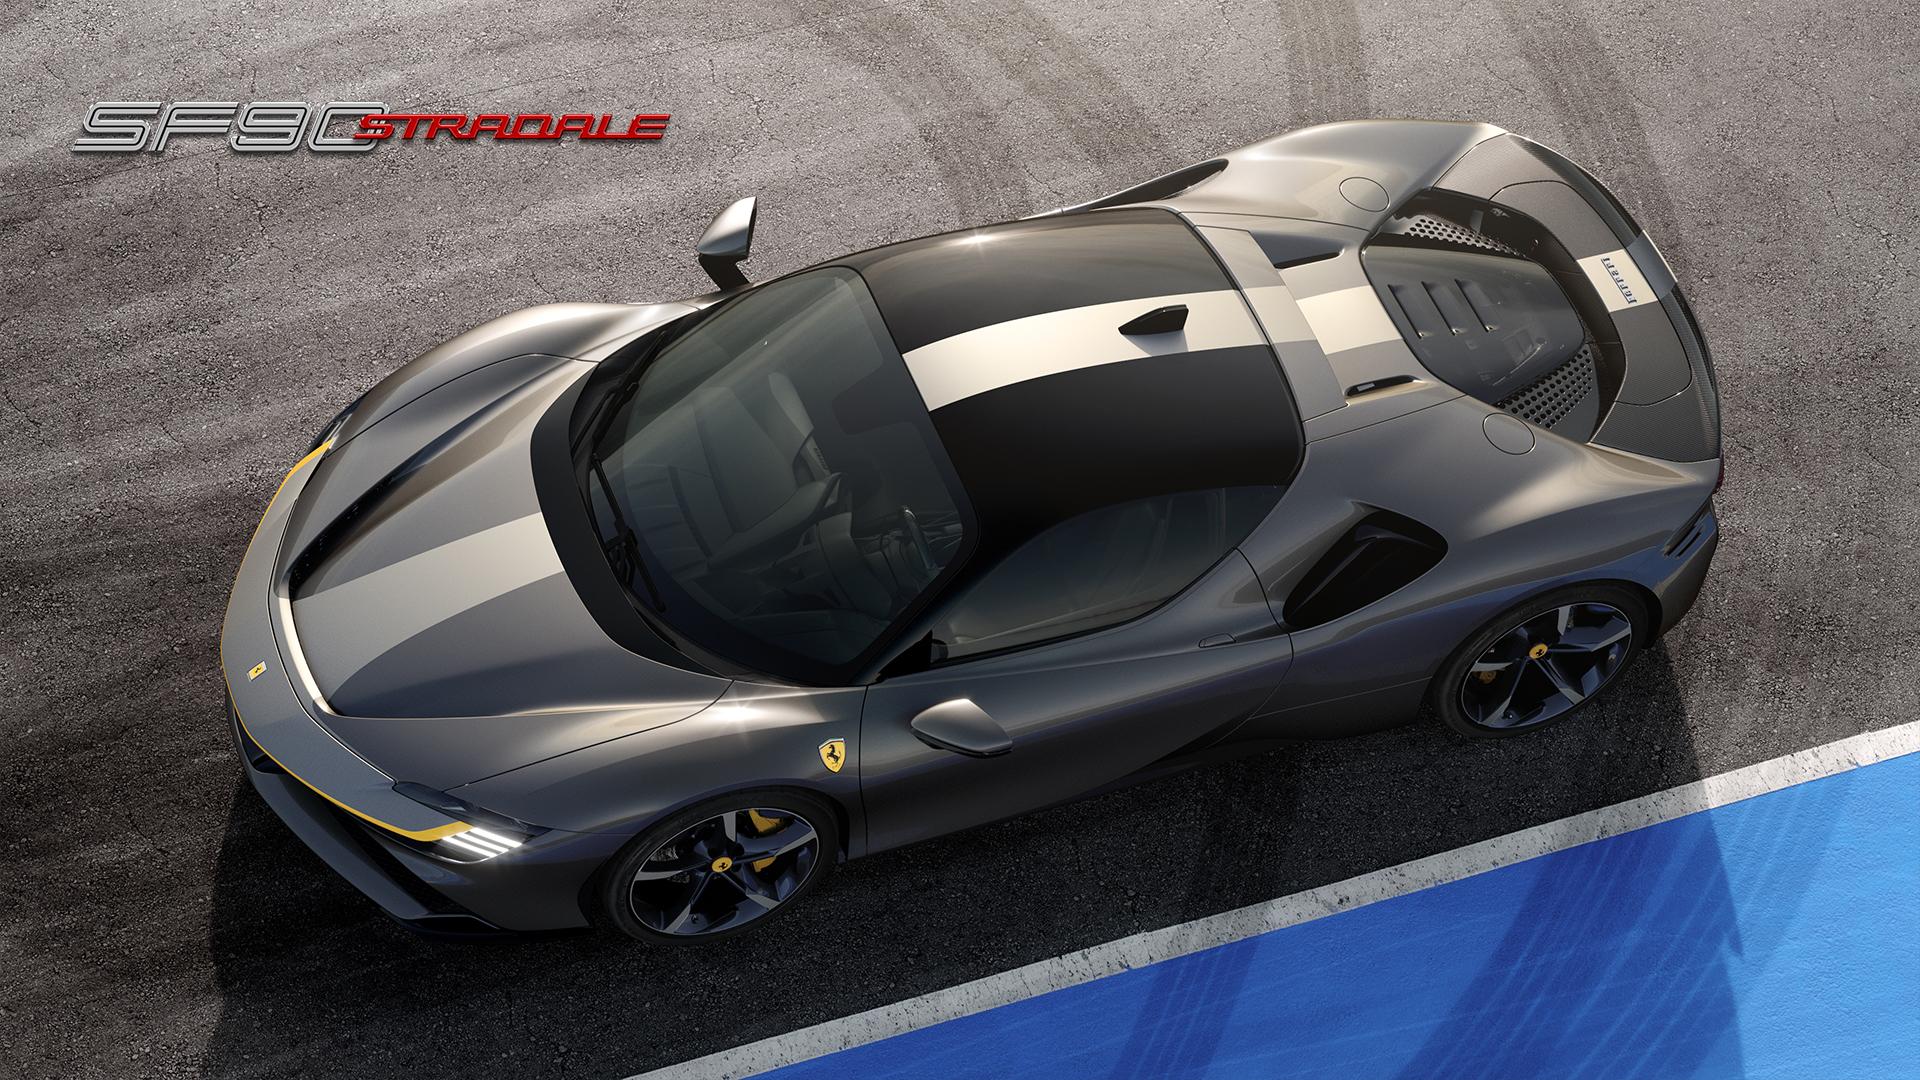 190167-car-Ferrari-SF90-Stradale.jpg